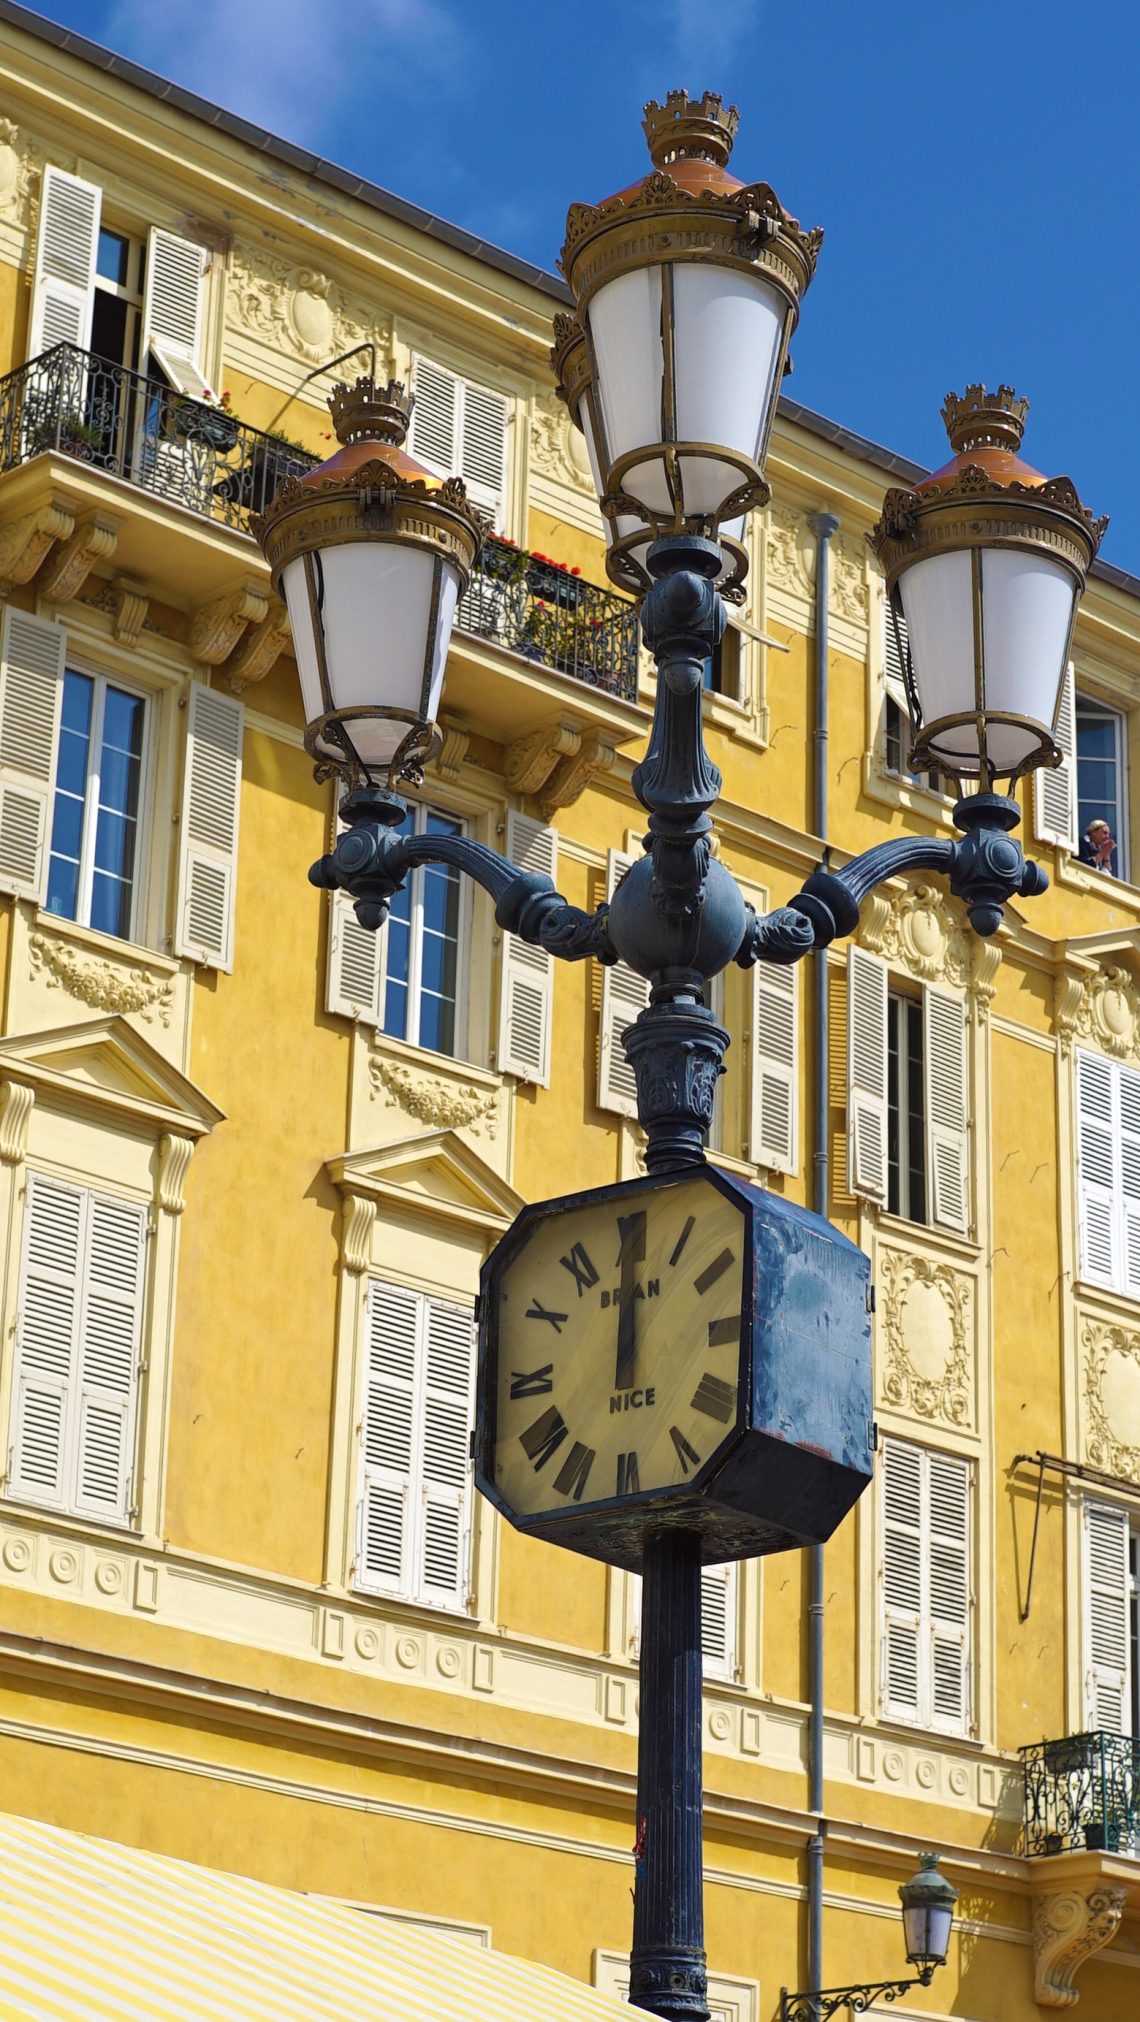 Clock in Nice against yellow brick